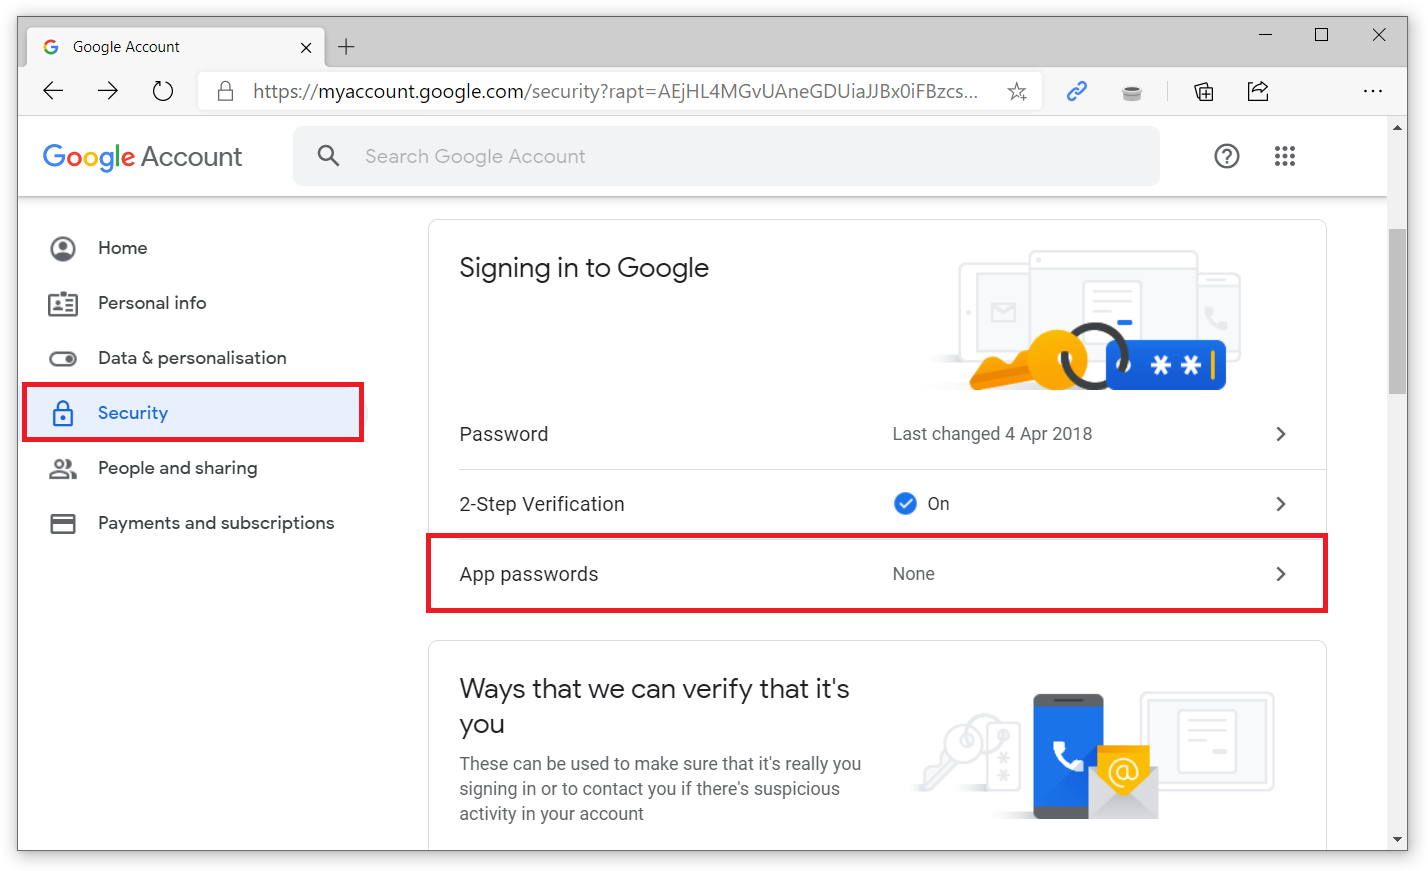 gmail pop3 settings outlook 2016